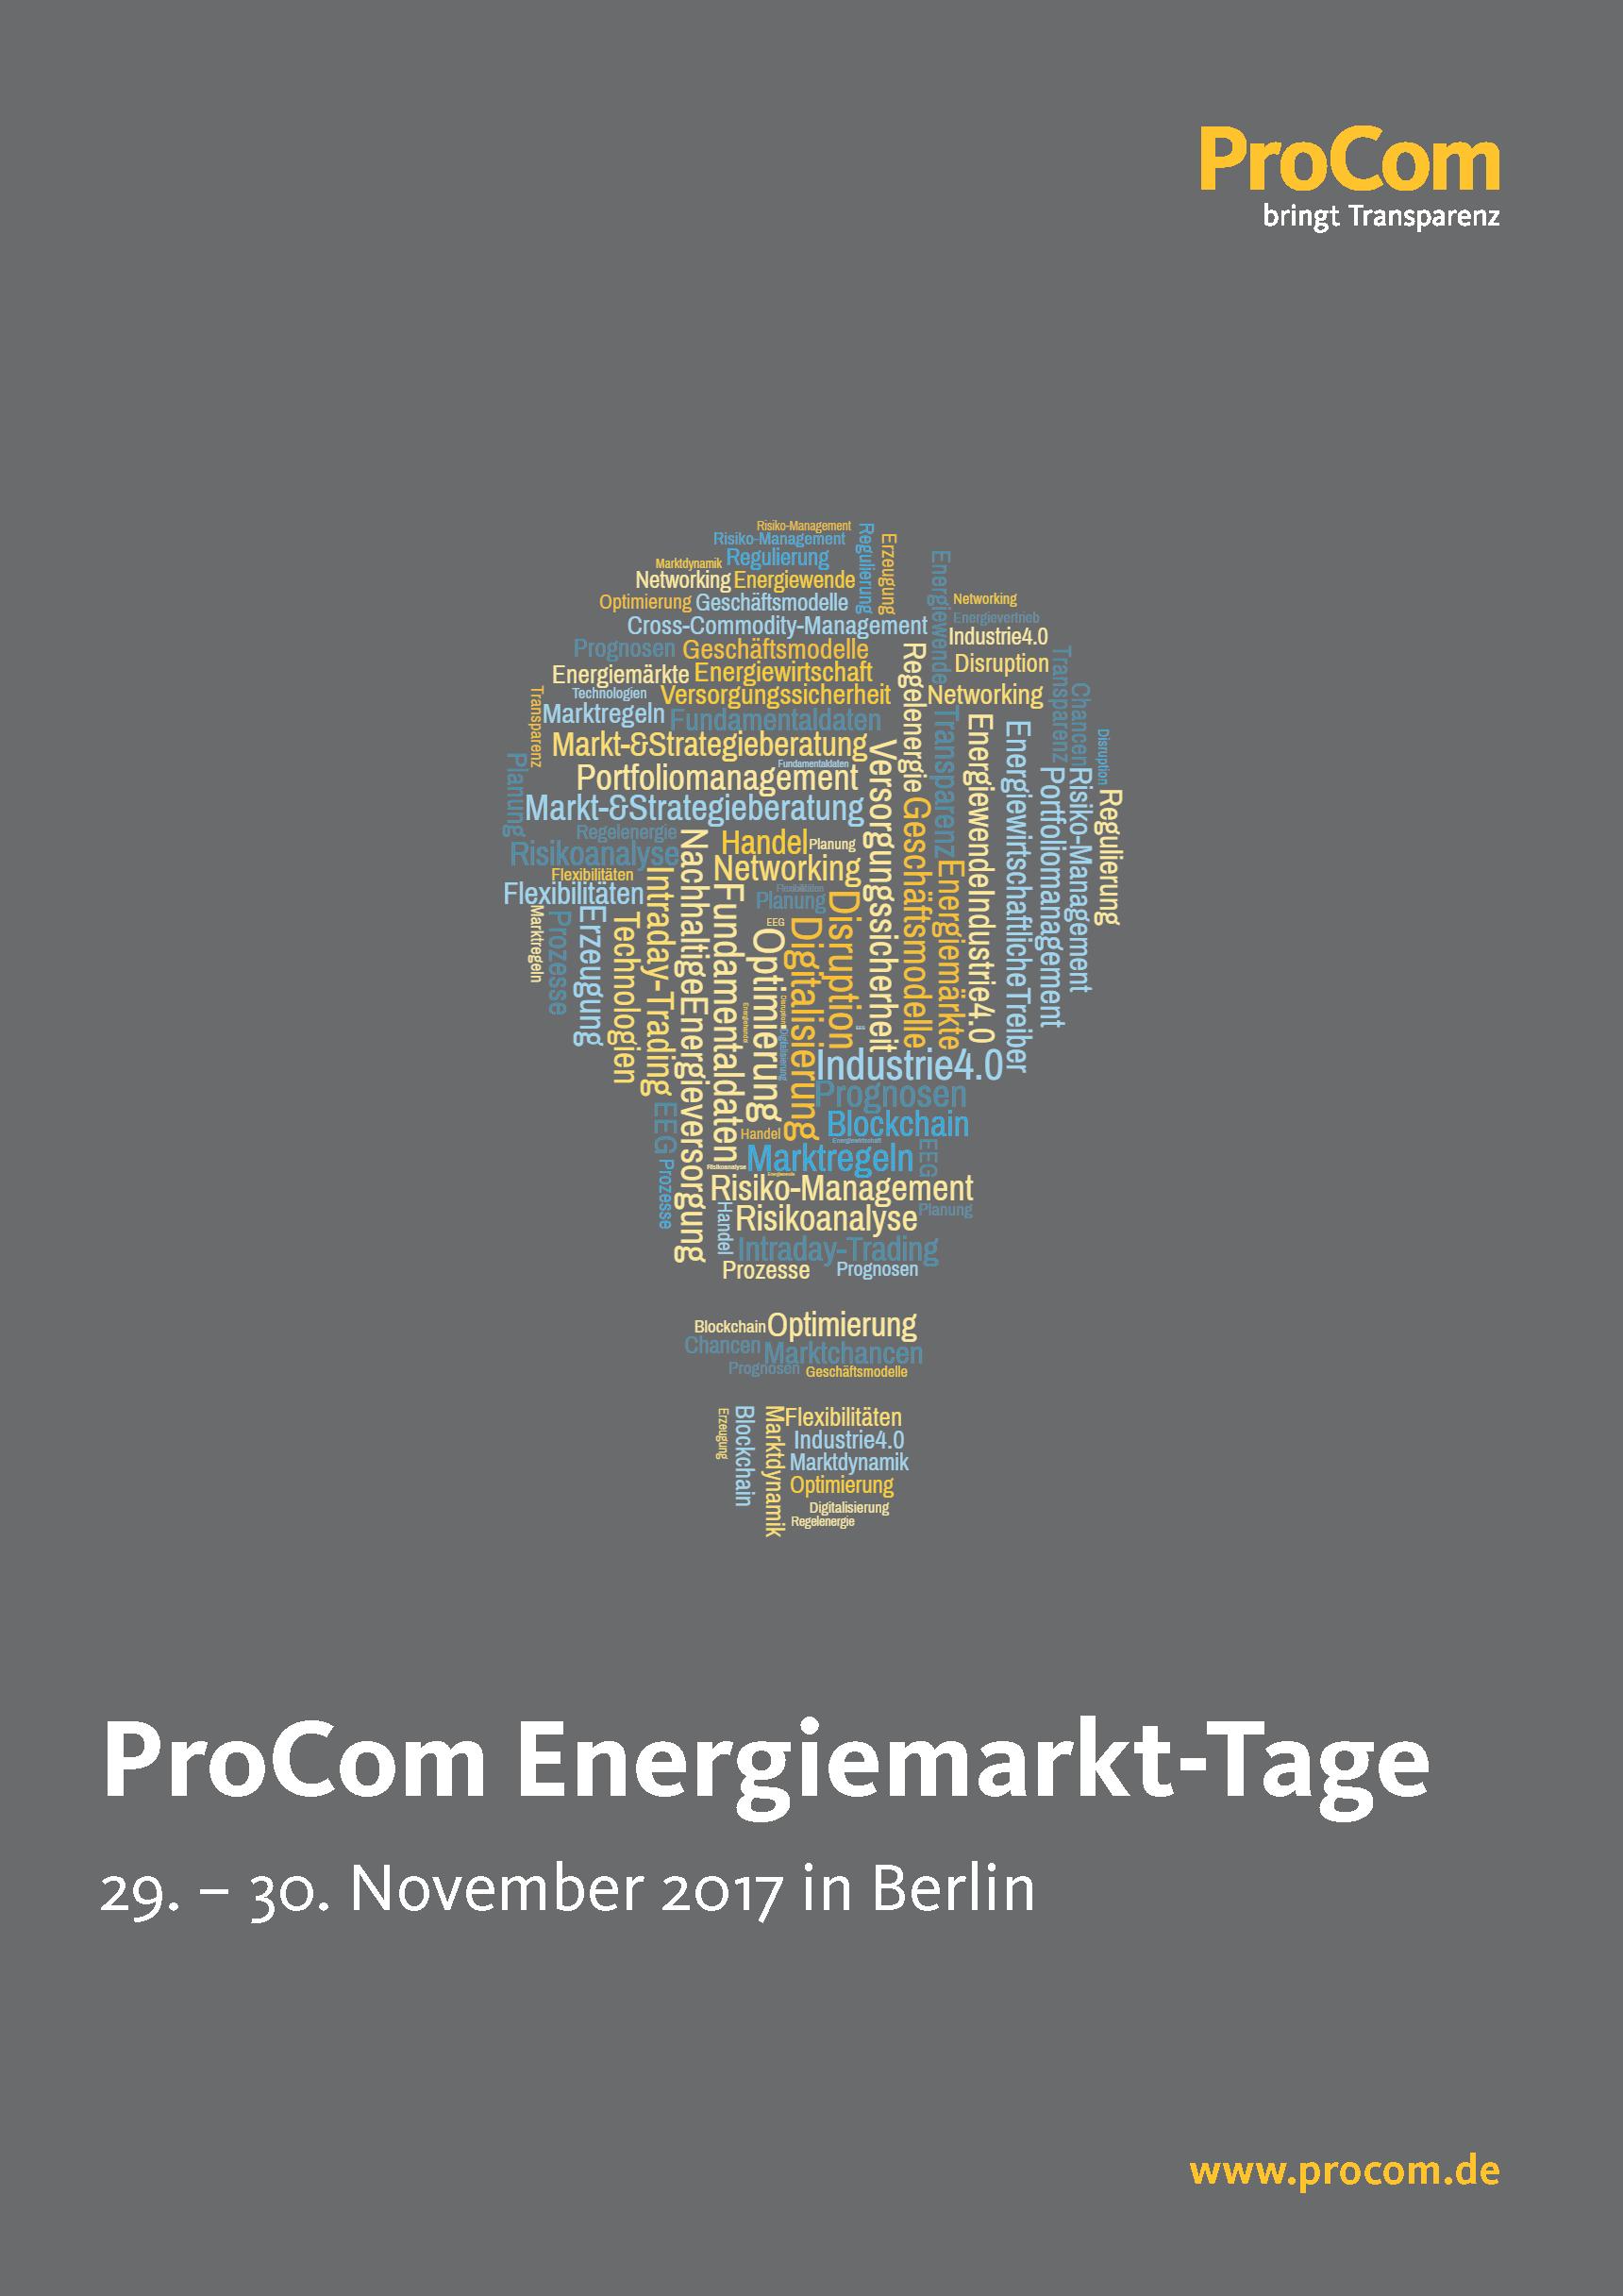 Procom Energiemarkttage